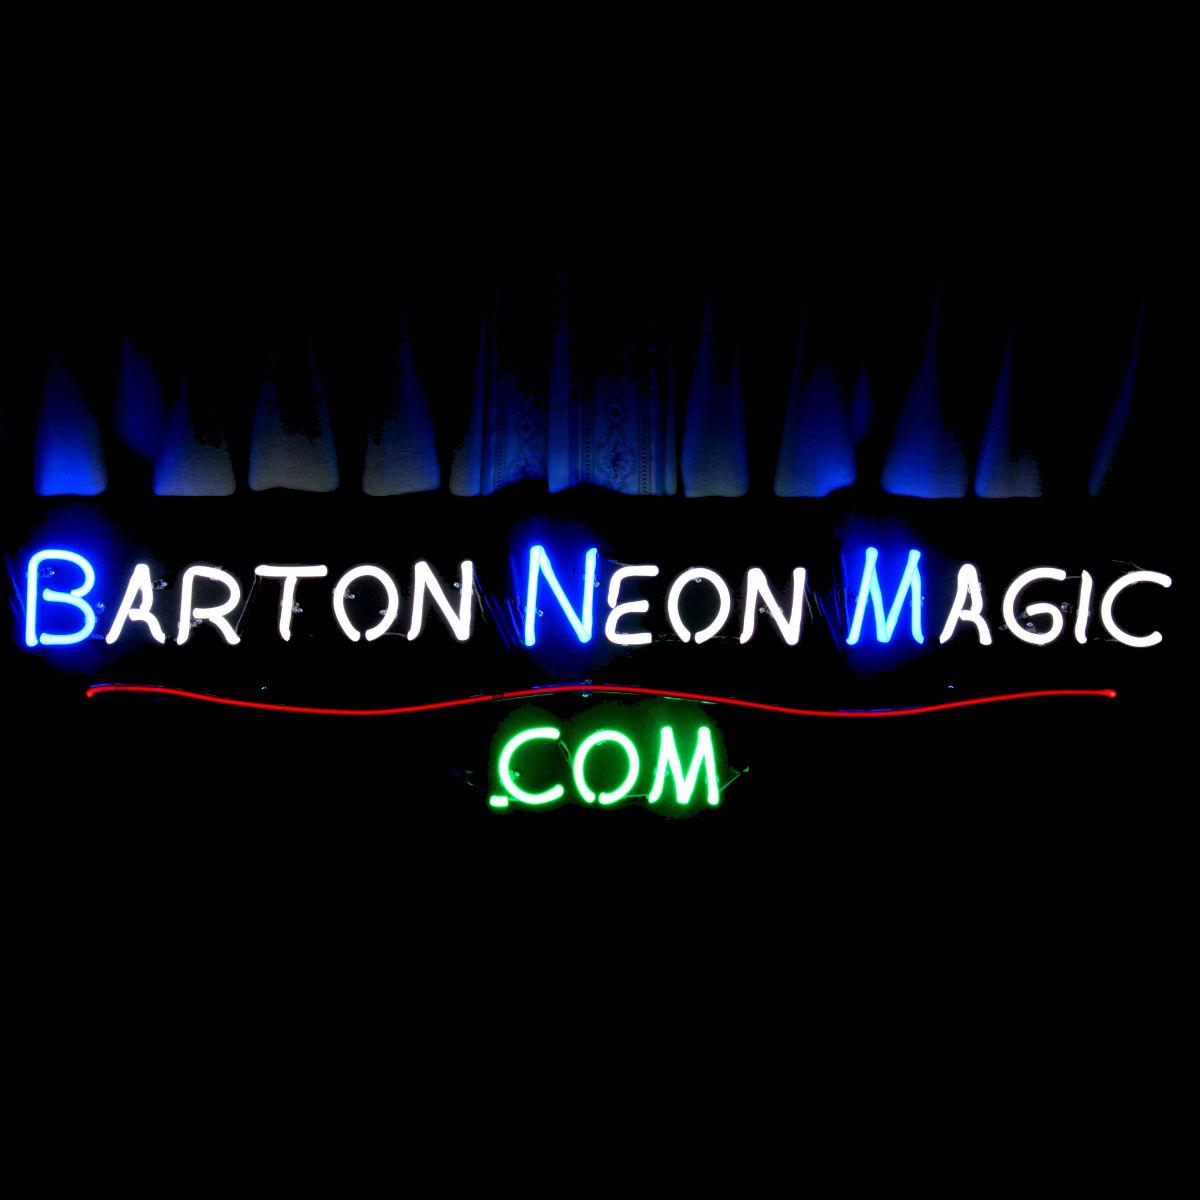 Custom New Car Dealership Neon Signs by John Barton - BartonNeonMagic.com